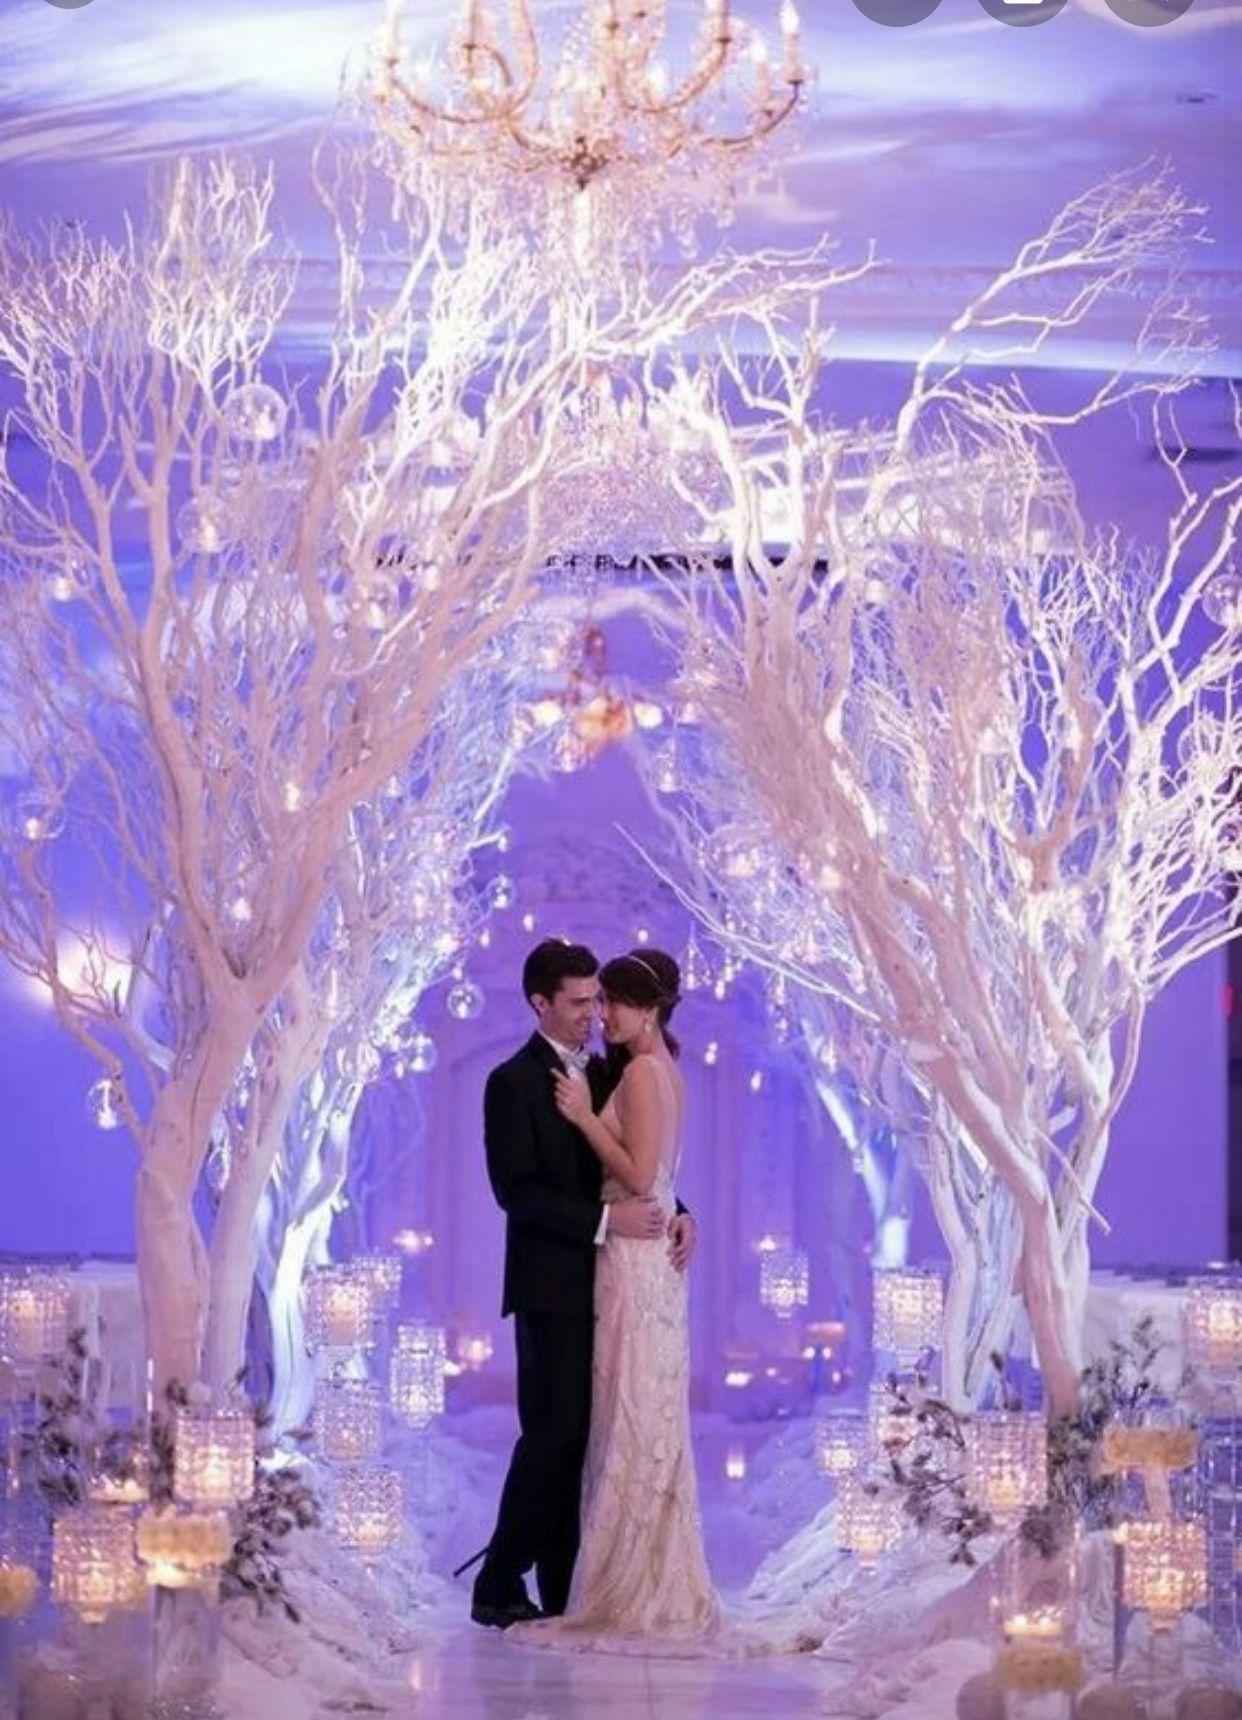 Pin by 👑Maria Glamour👑 on Wed   Winter wonderland wedding ...